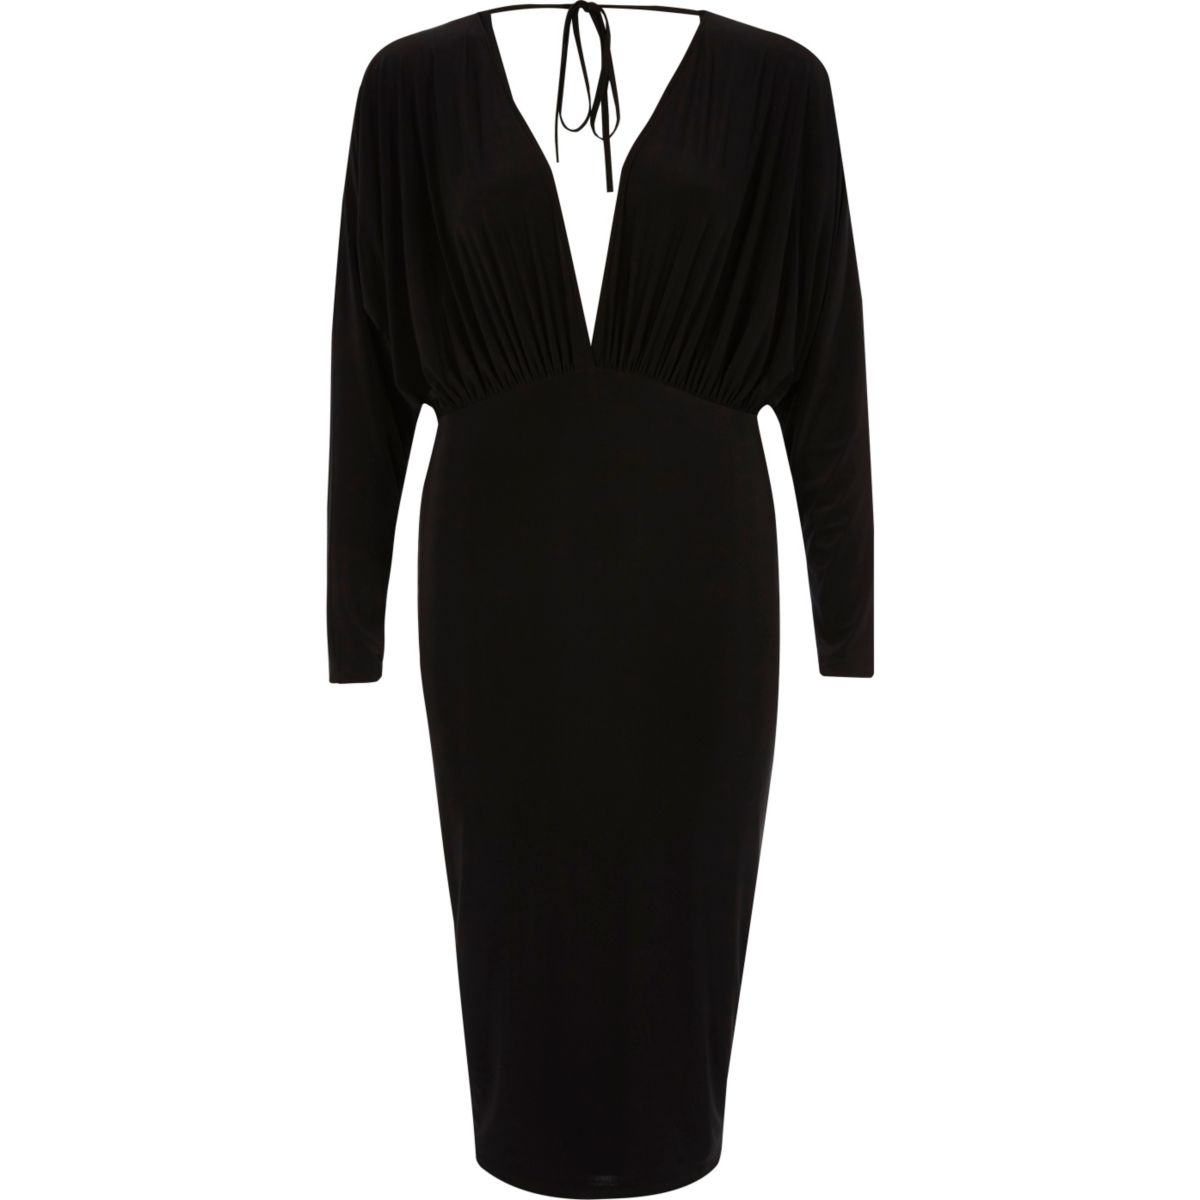 Black batwing plunge bodycon midi dress